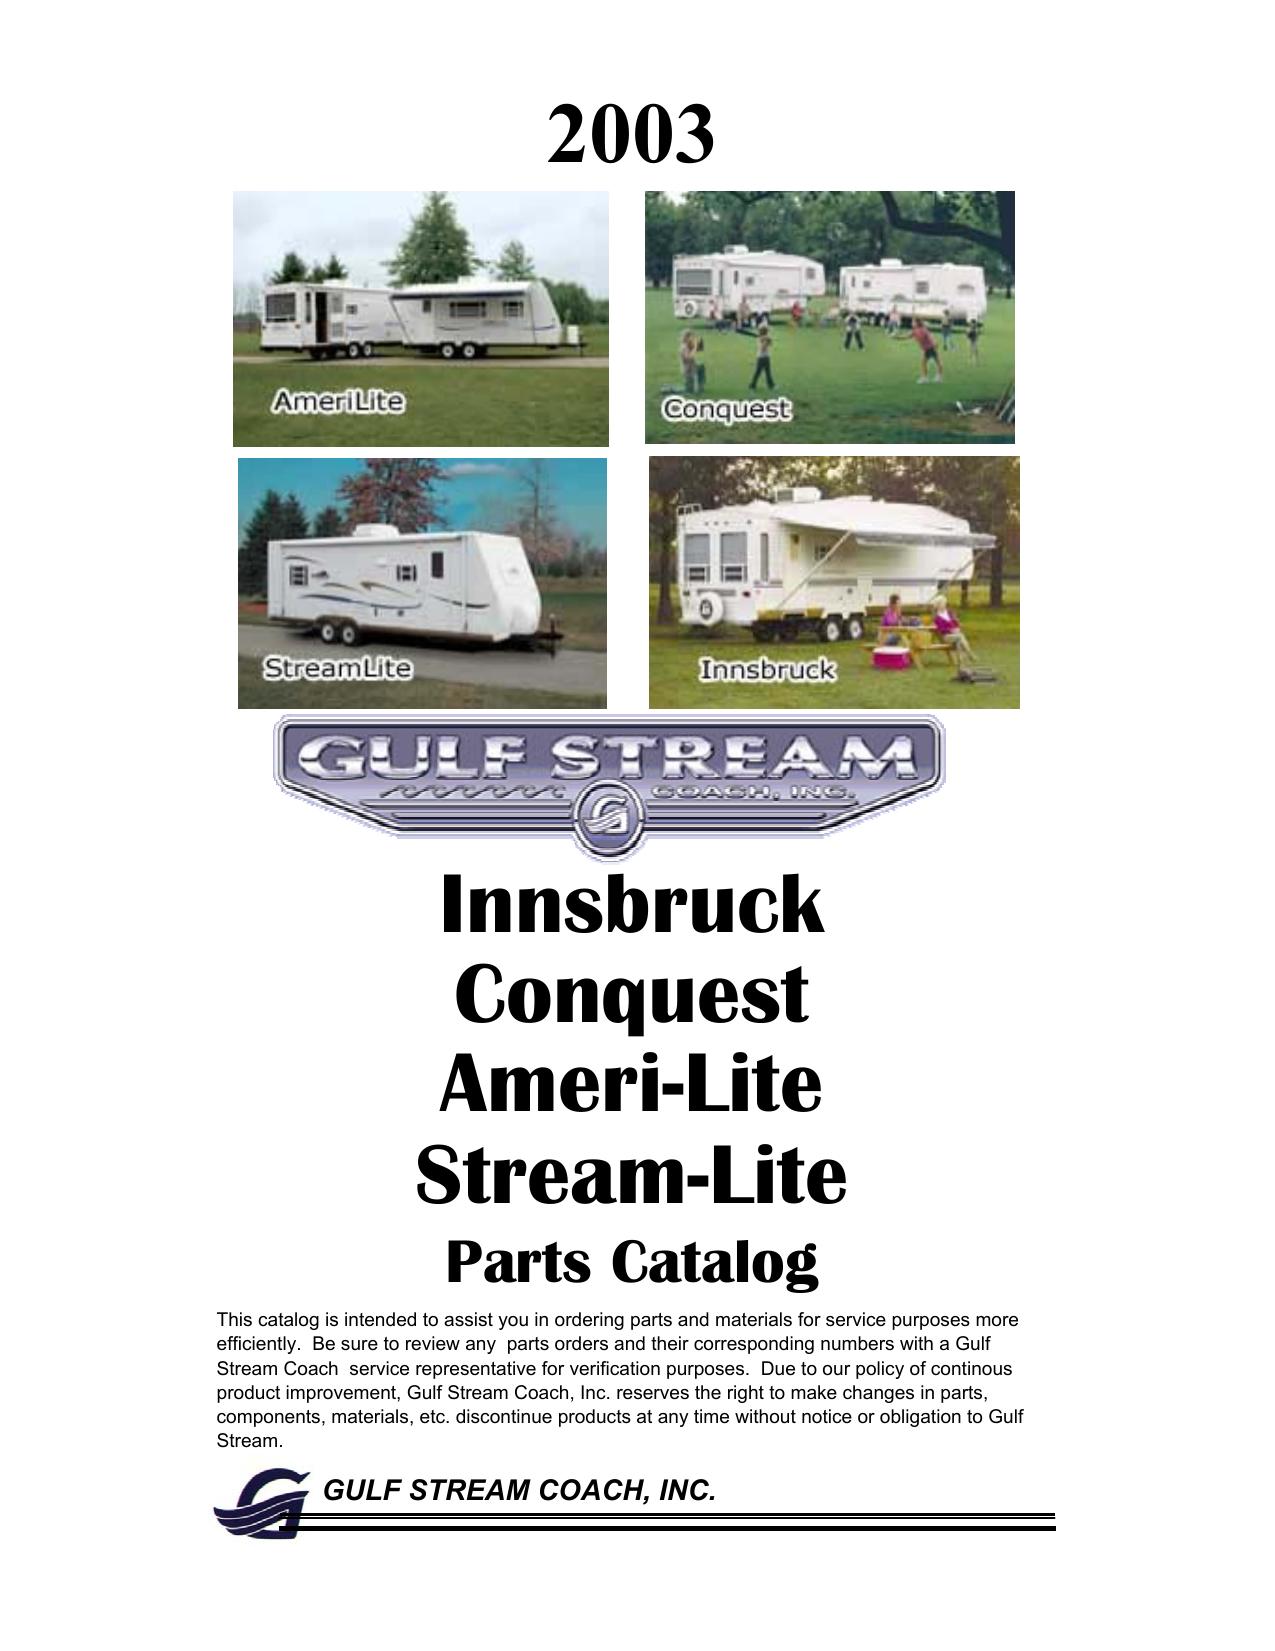 2003 Innsbruck/Conquest Floor Plans | manualzz com